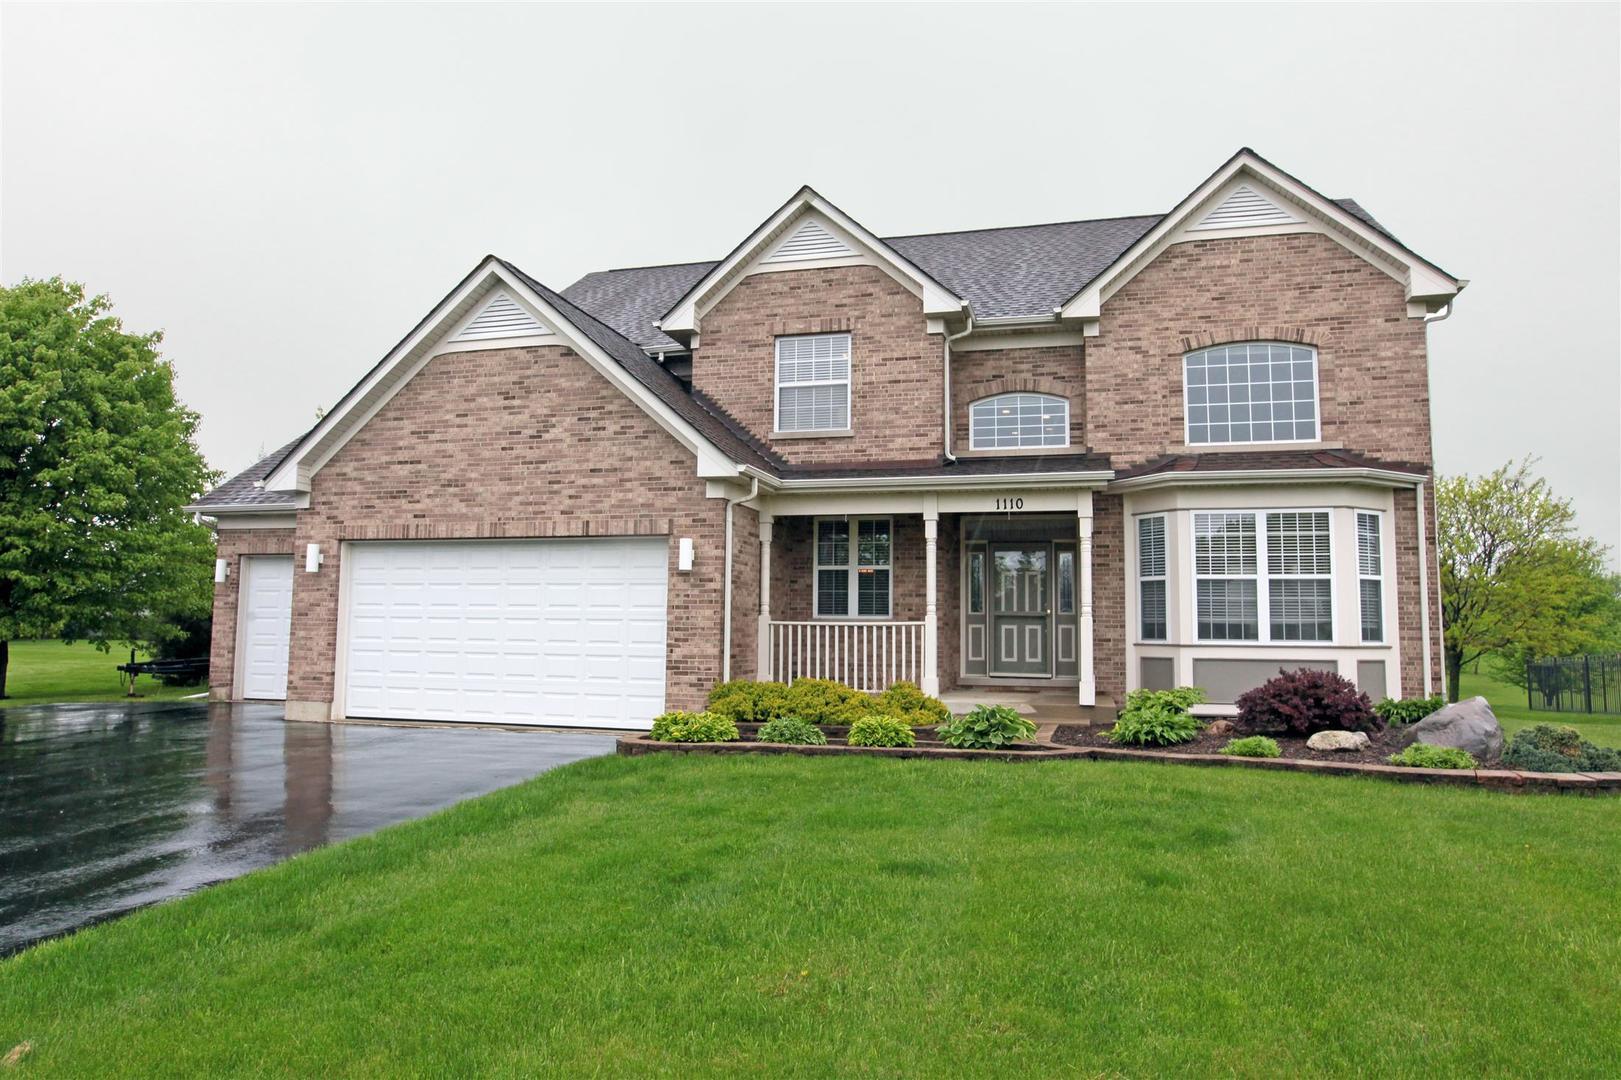 Property for sale at 1110 Joseph Circle, Johnsburg,  IL 60051